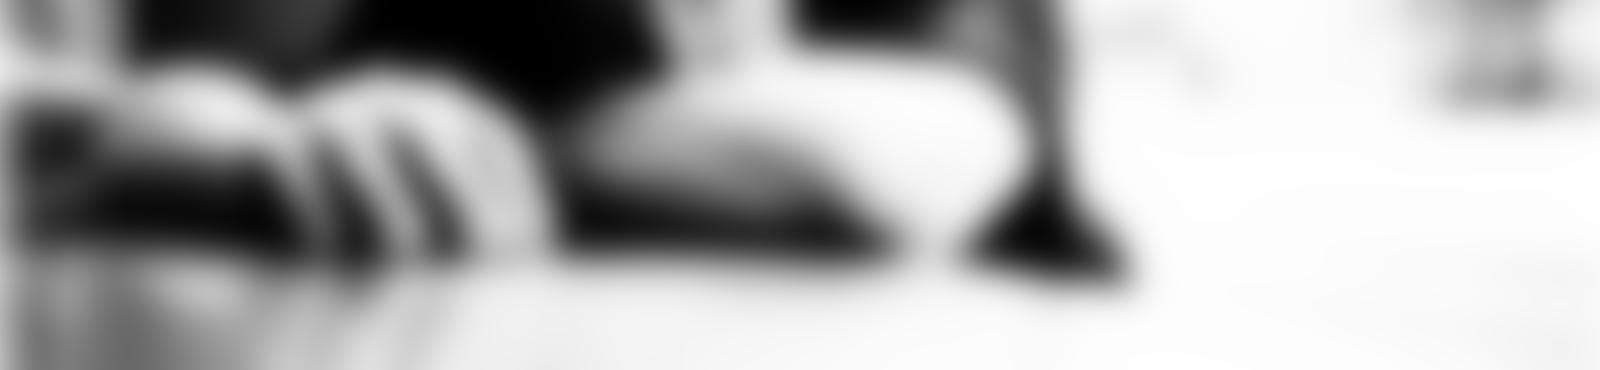 Blurred 2b98f9bc be3a 475c 8549 d6e02100acfa